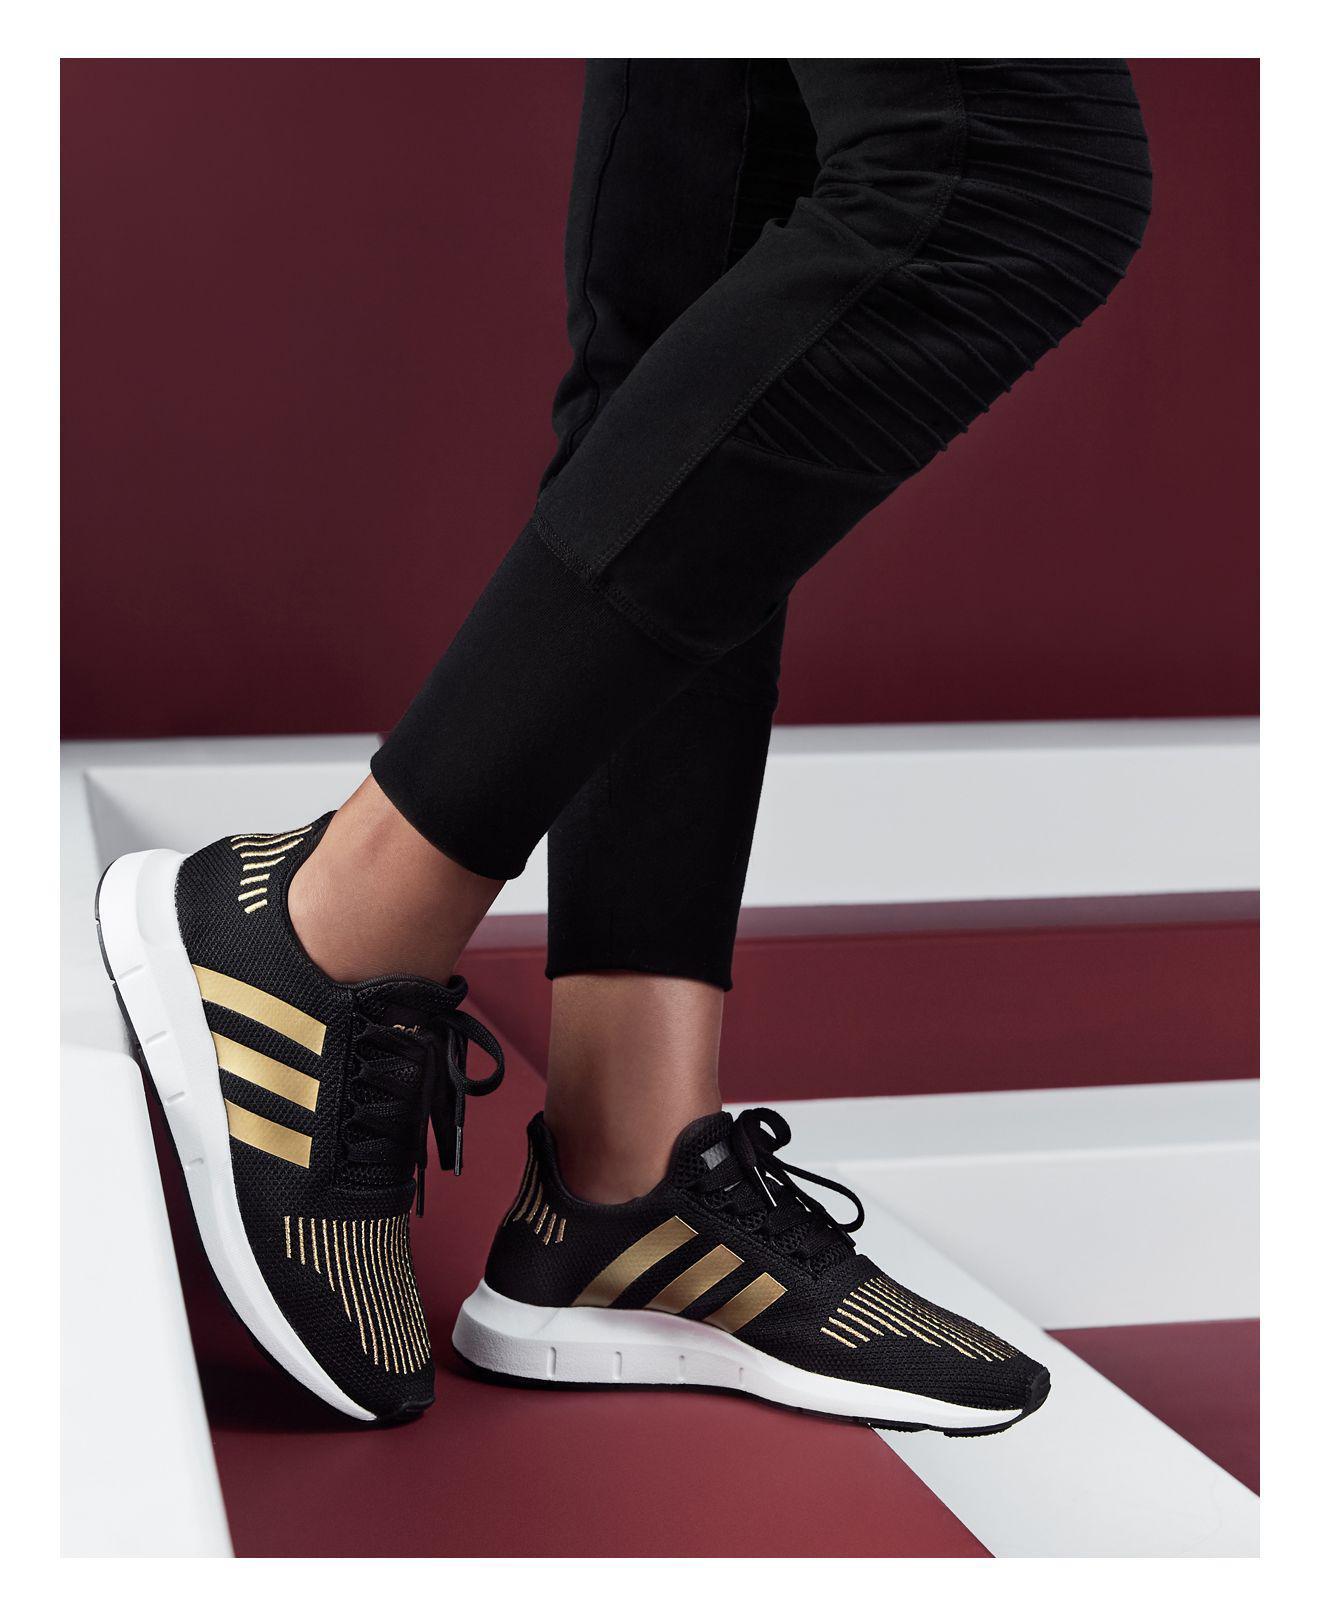 first rate a4b08 54ab0 adidas Women s Swift Run Sneakers in Metallic - Lyst